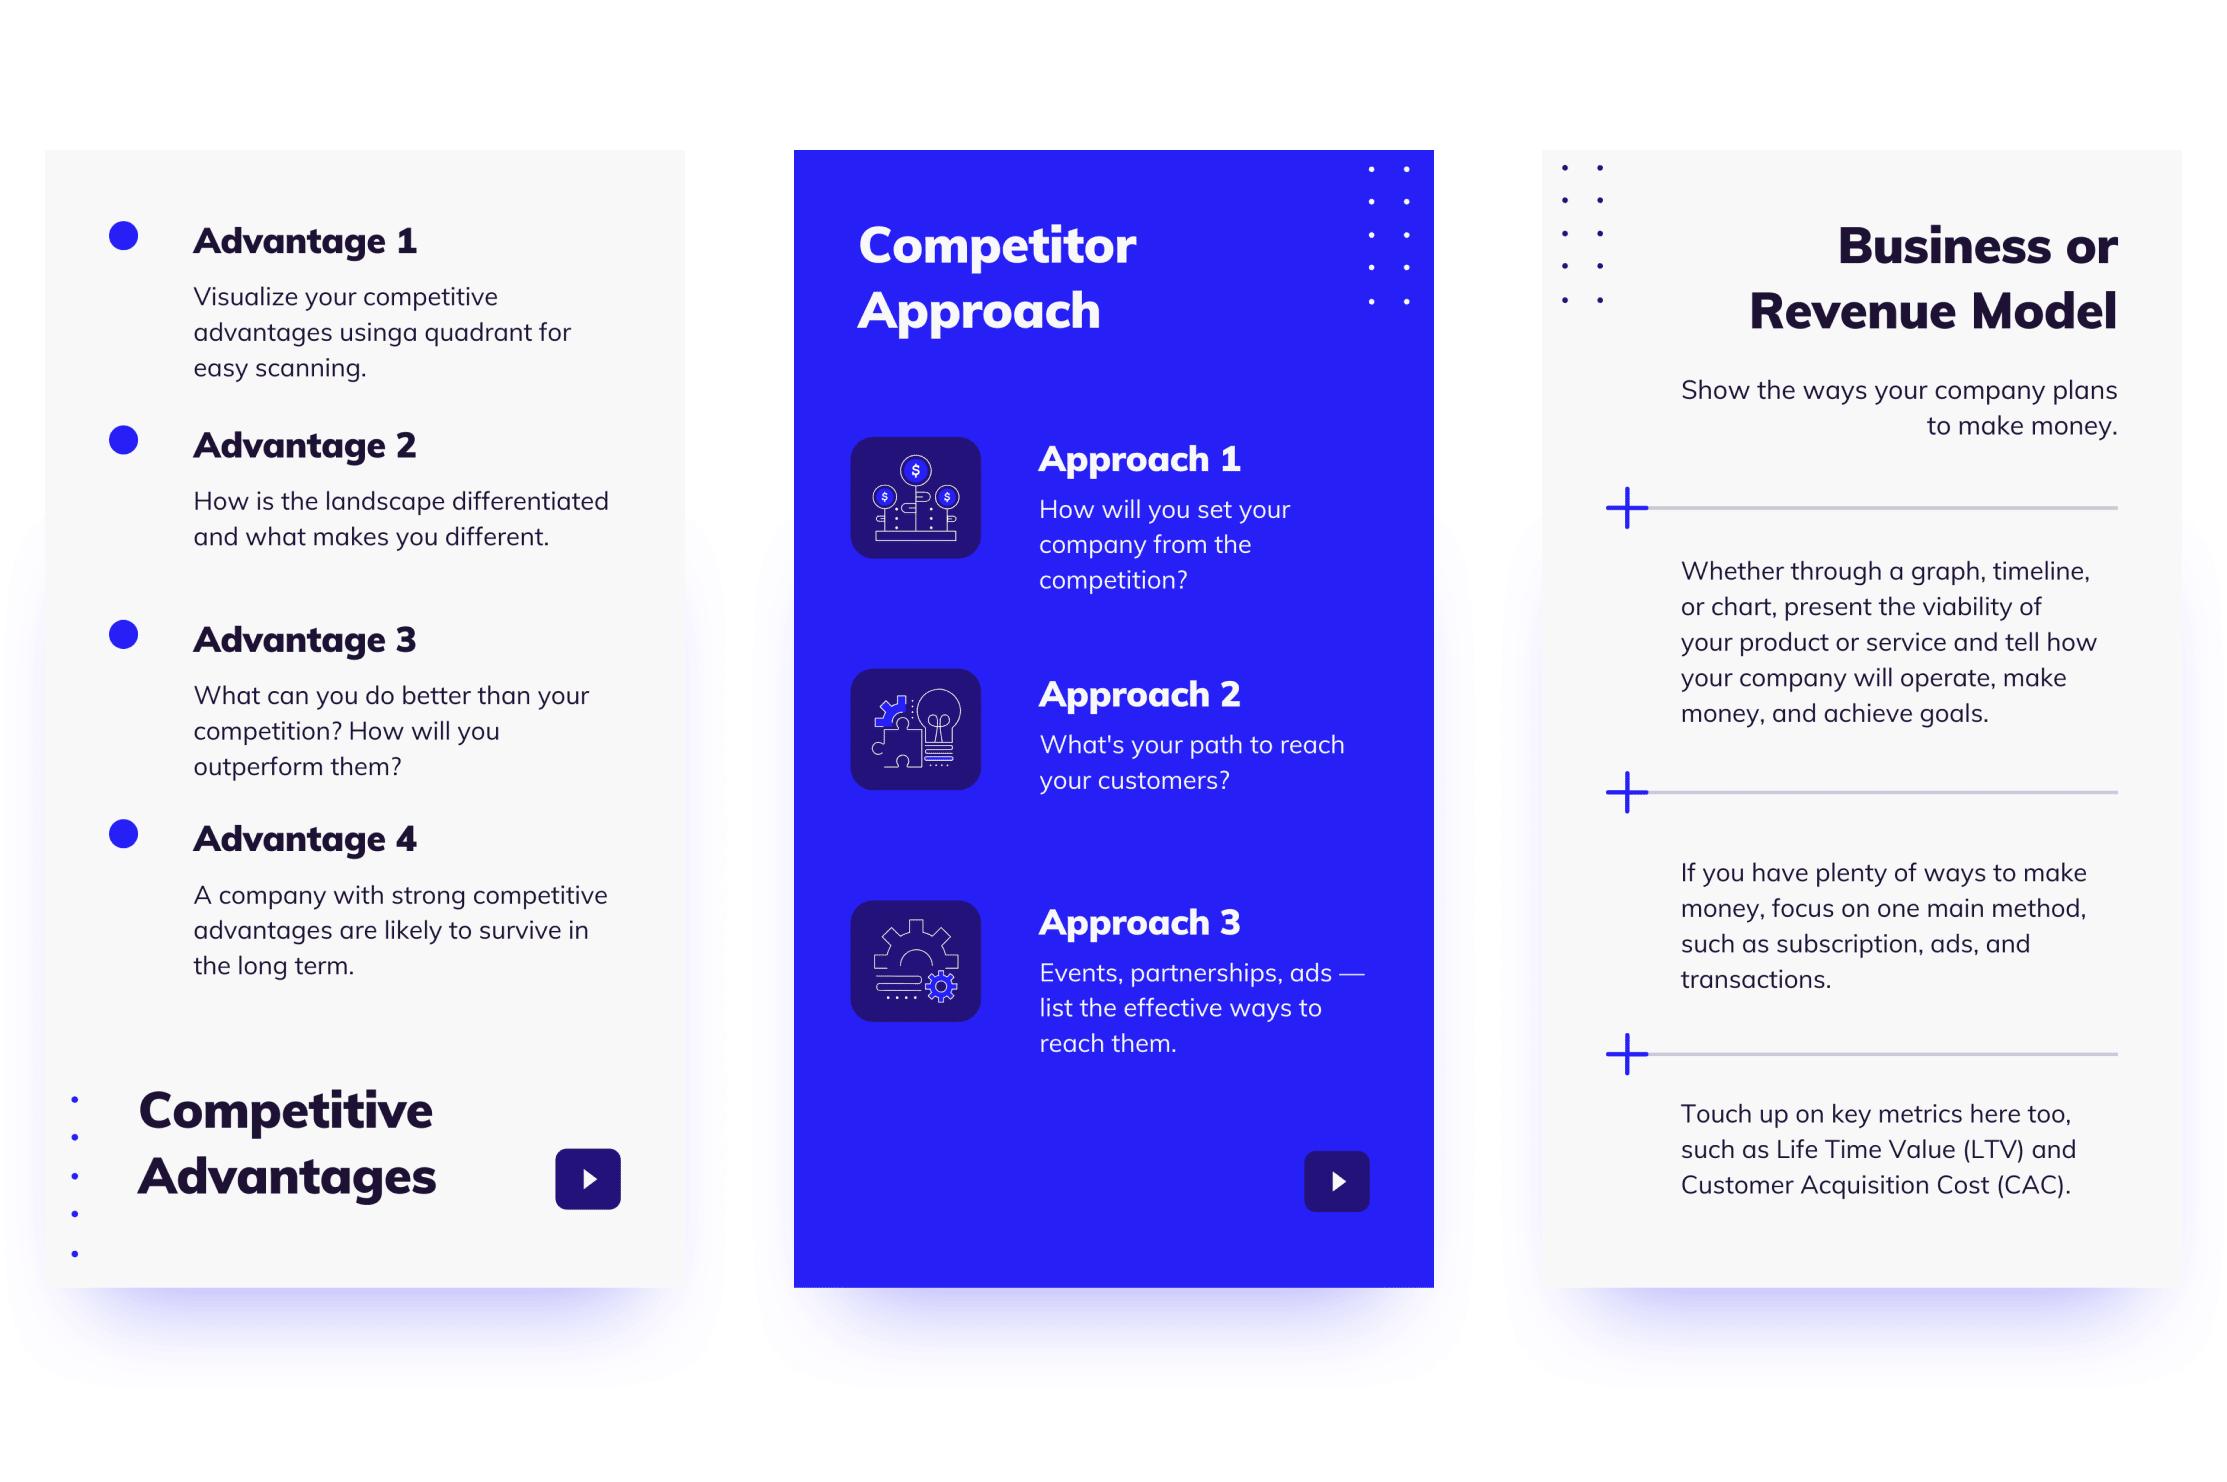 mobile-first presentation company advantages